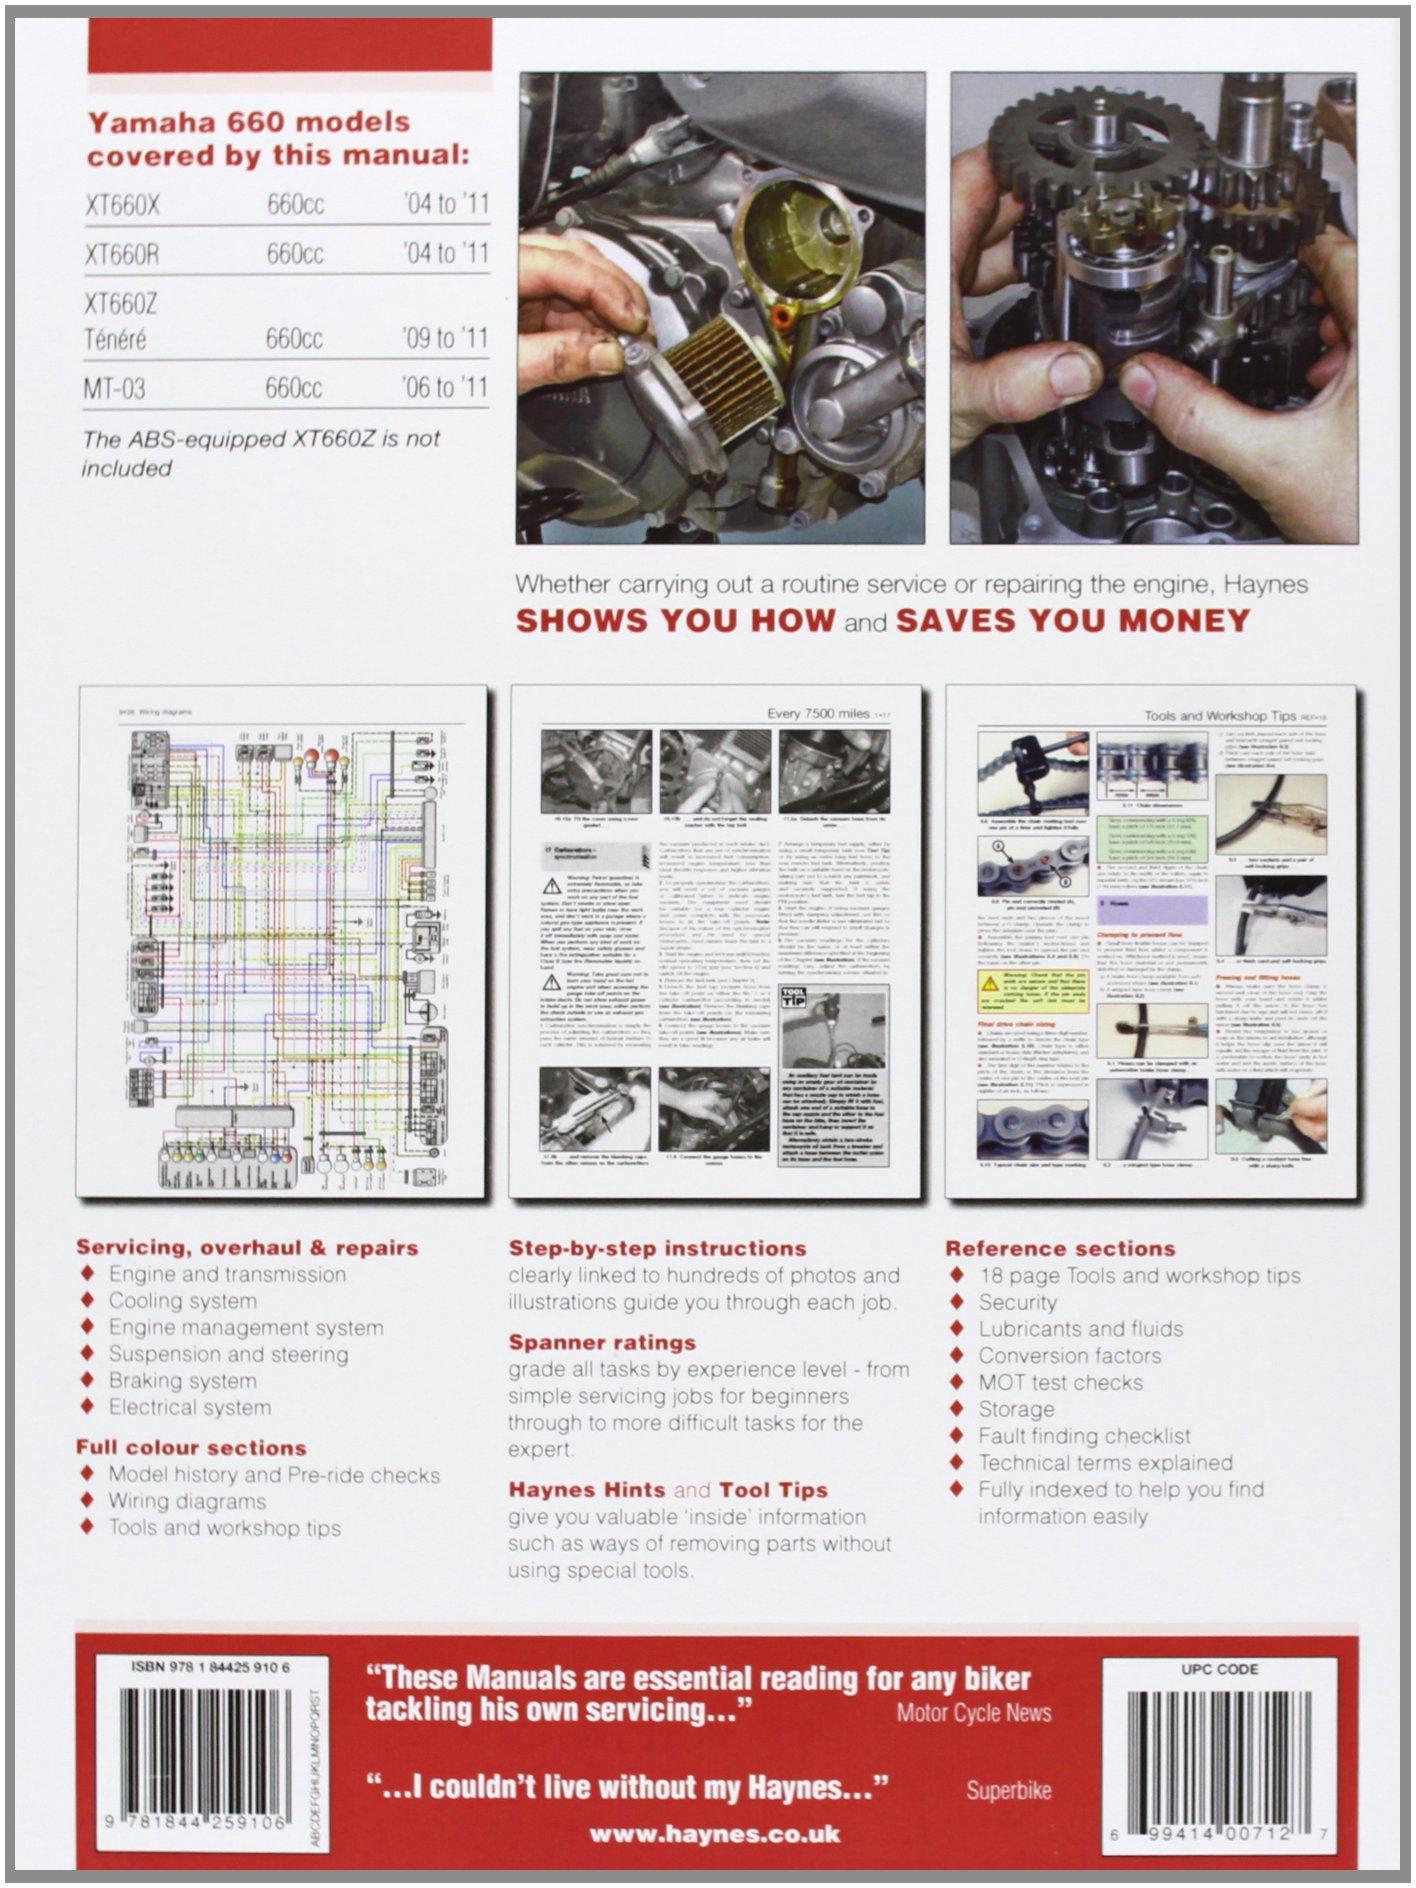 Yamaha Xt600 Mt 03 Service And Repair Manual 2004 To 2011 Xt 600 Tenere Wiring Diagram Matthew Coombs 9781844259106 Books